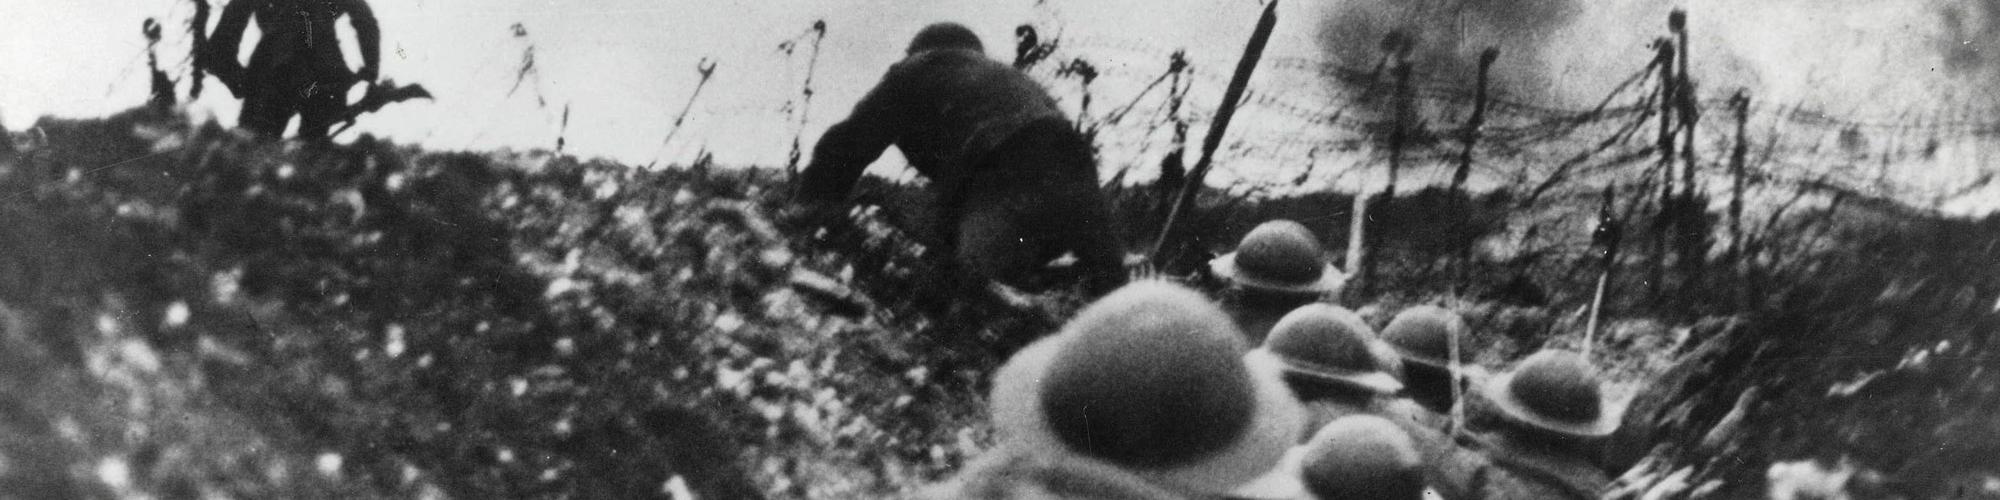 I. világháború